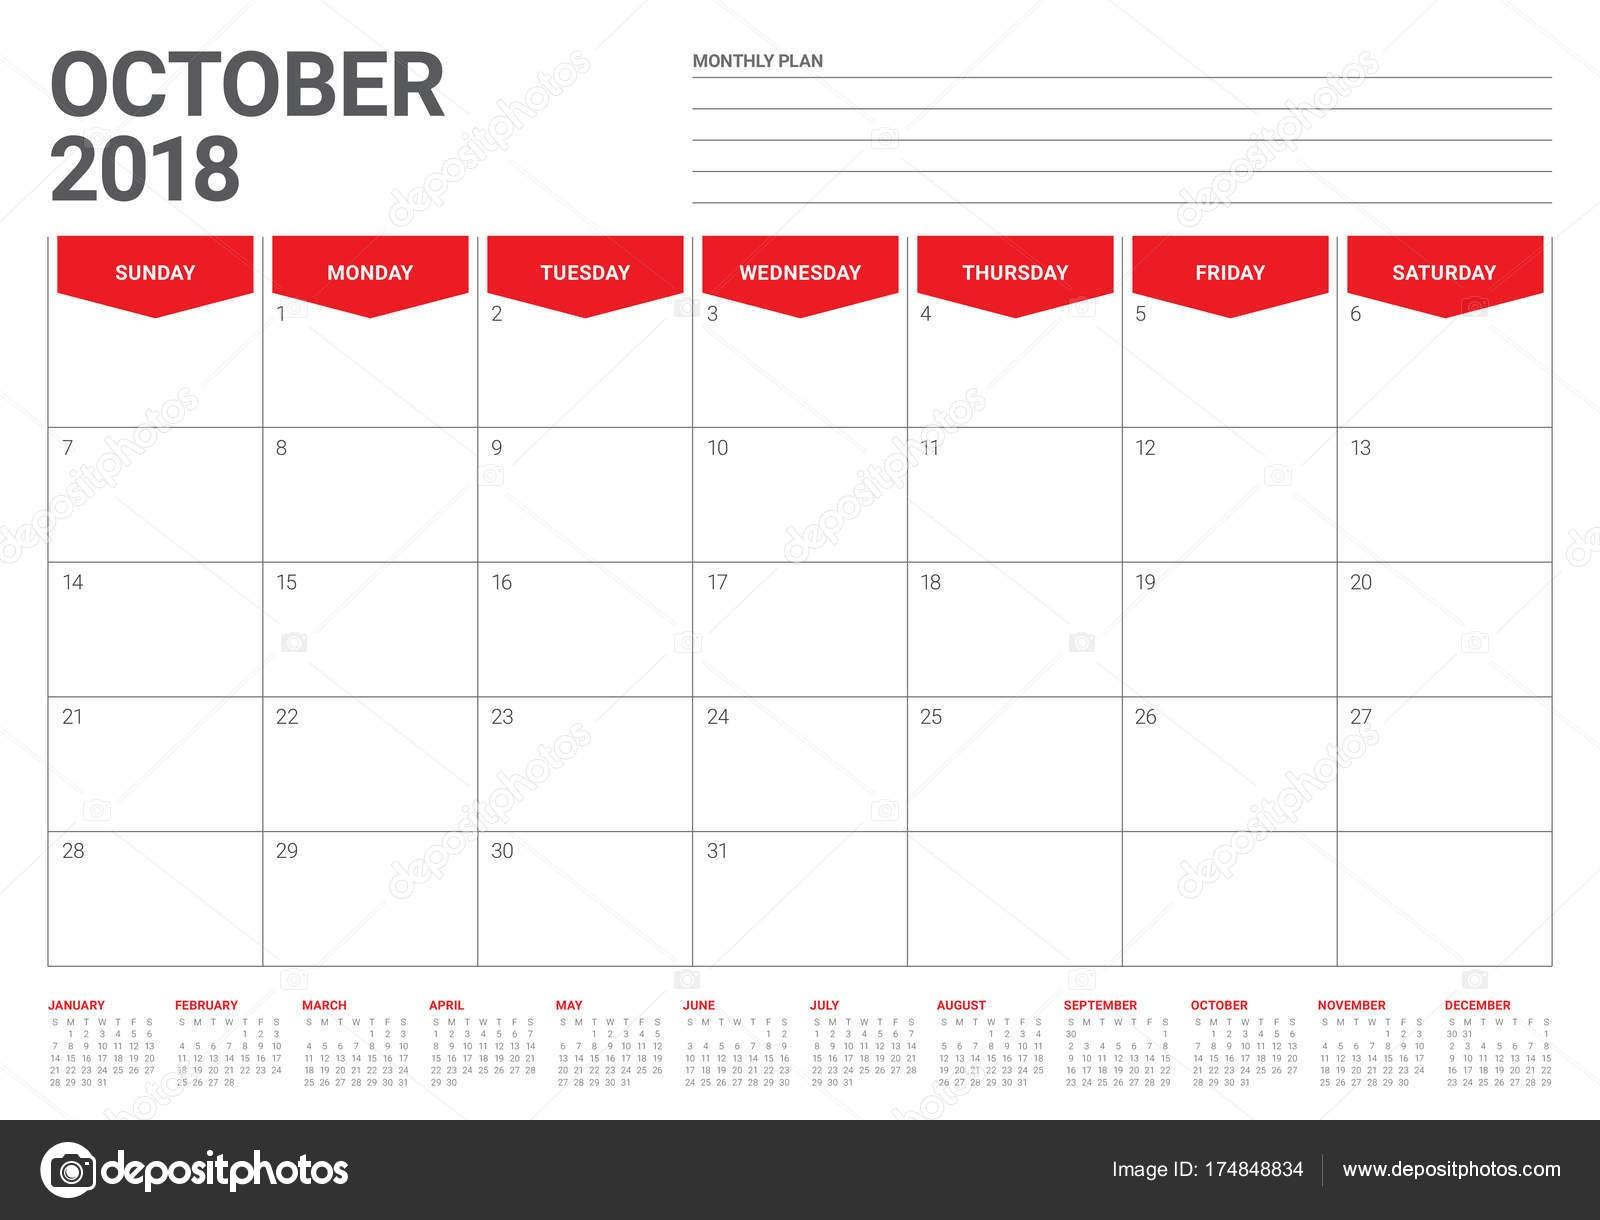 depositphotos stock illustration october 2018 planner calendar vector